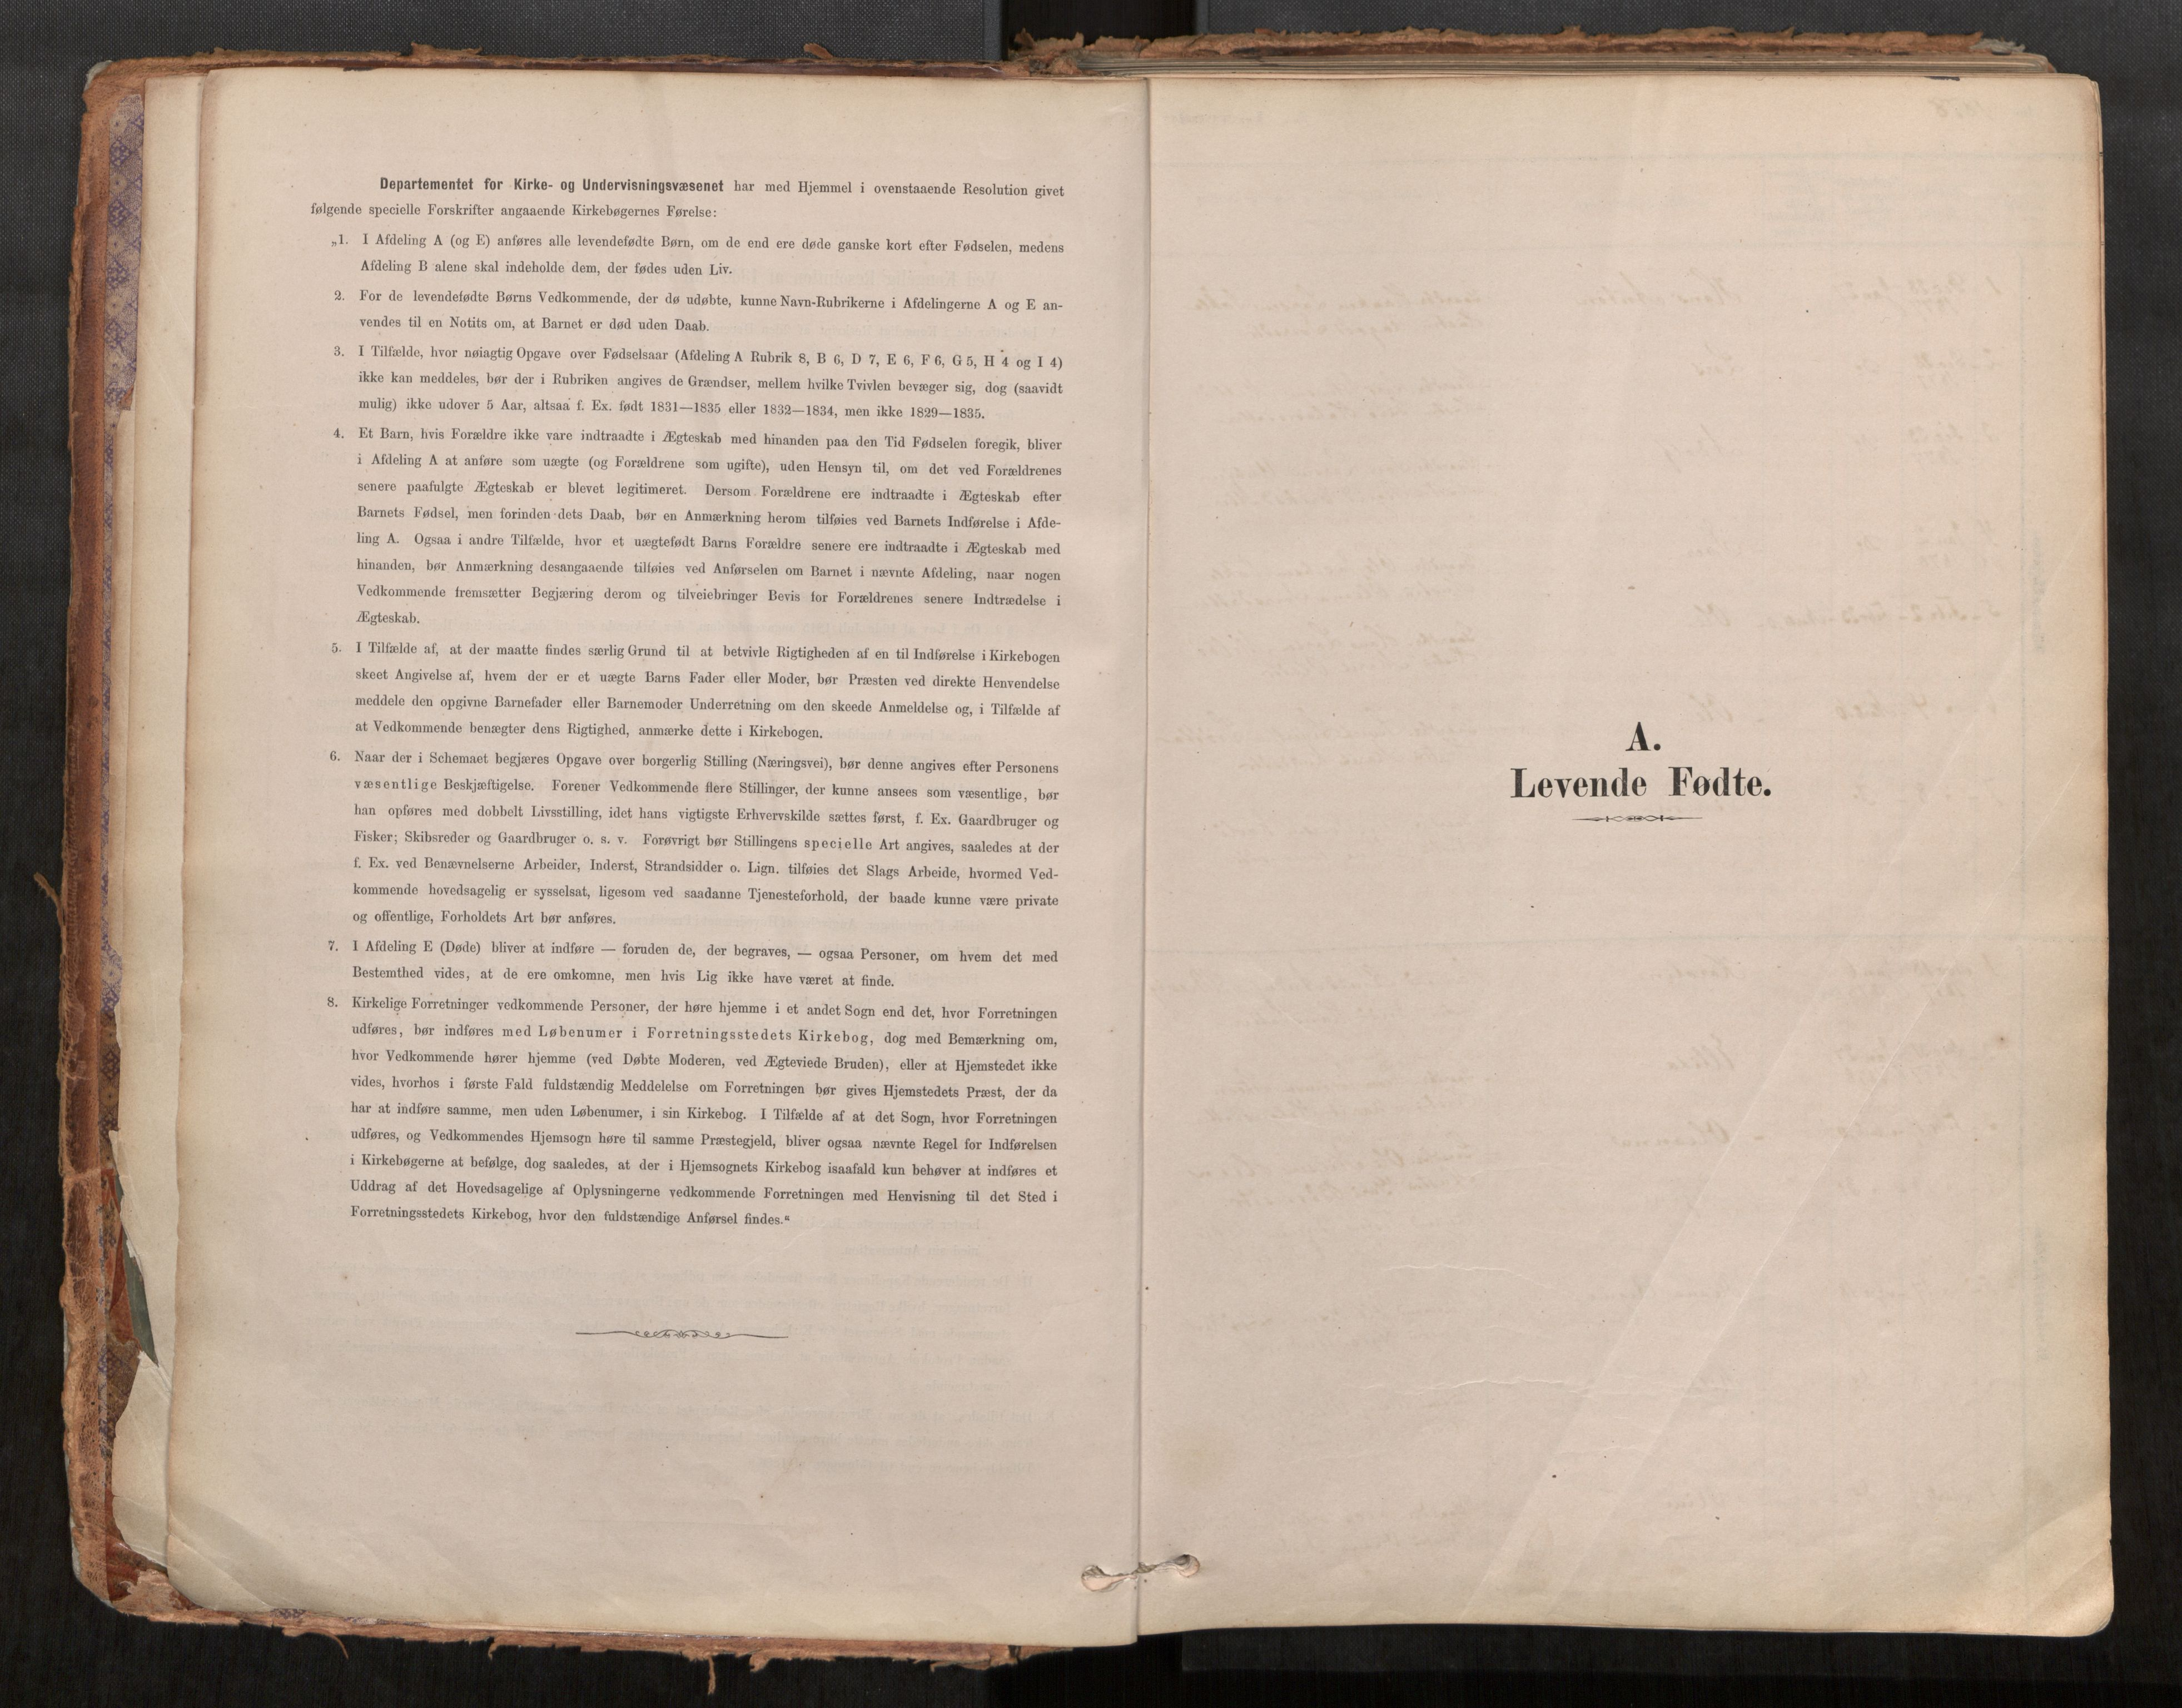 SAT, Grytten sokneprestkontor, Ministerialbok nr. 545A03, 1878-1920